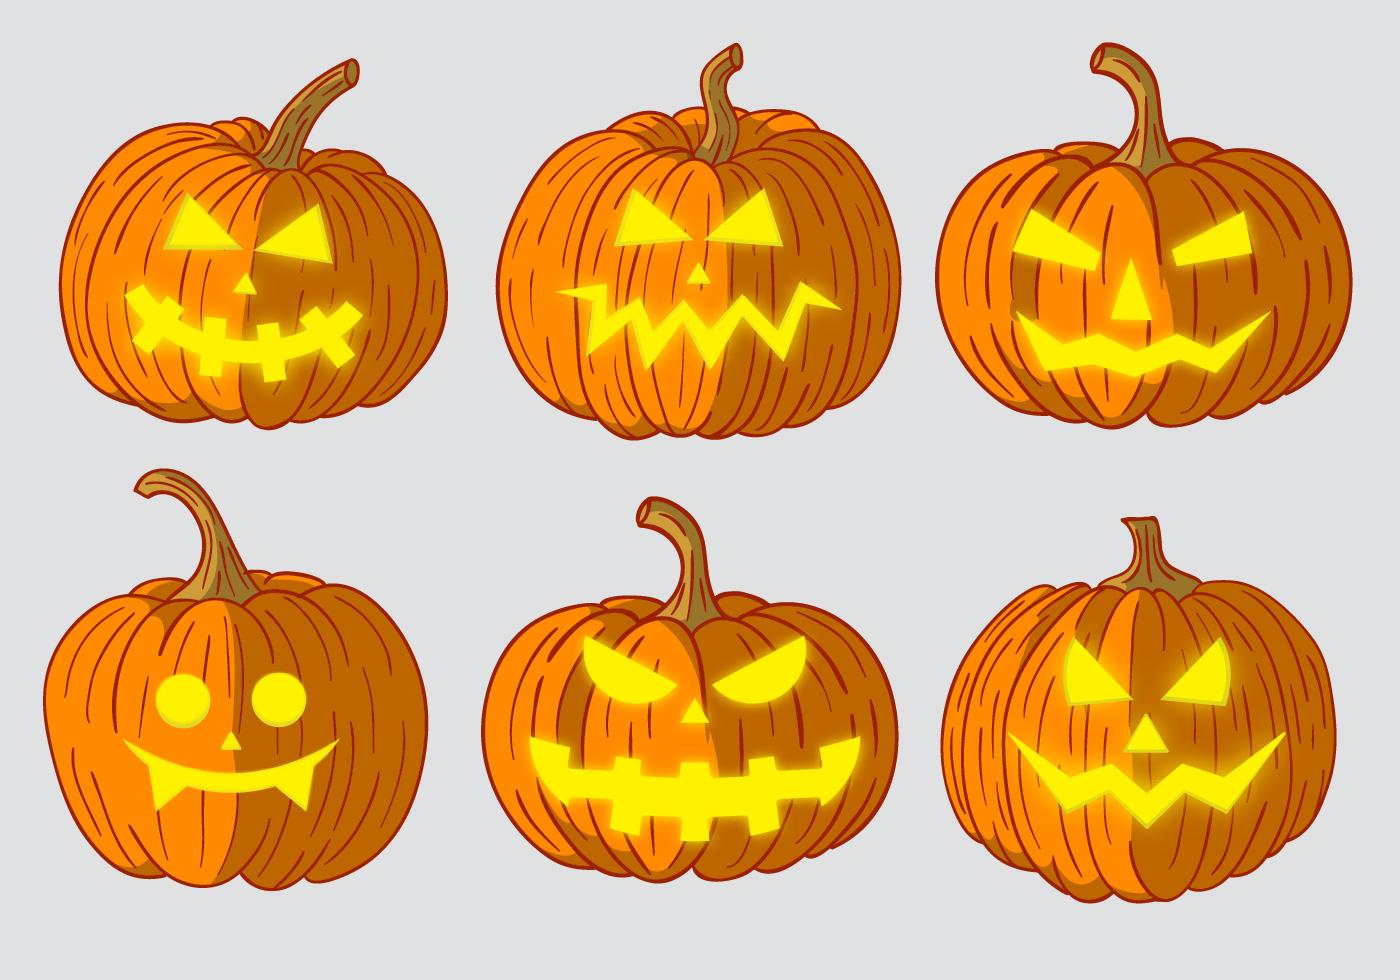 Scary Pumpkin Head Vectors - Download Free Vector Art, Stock ...